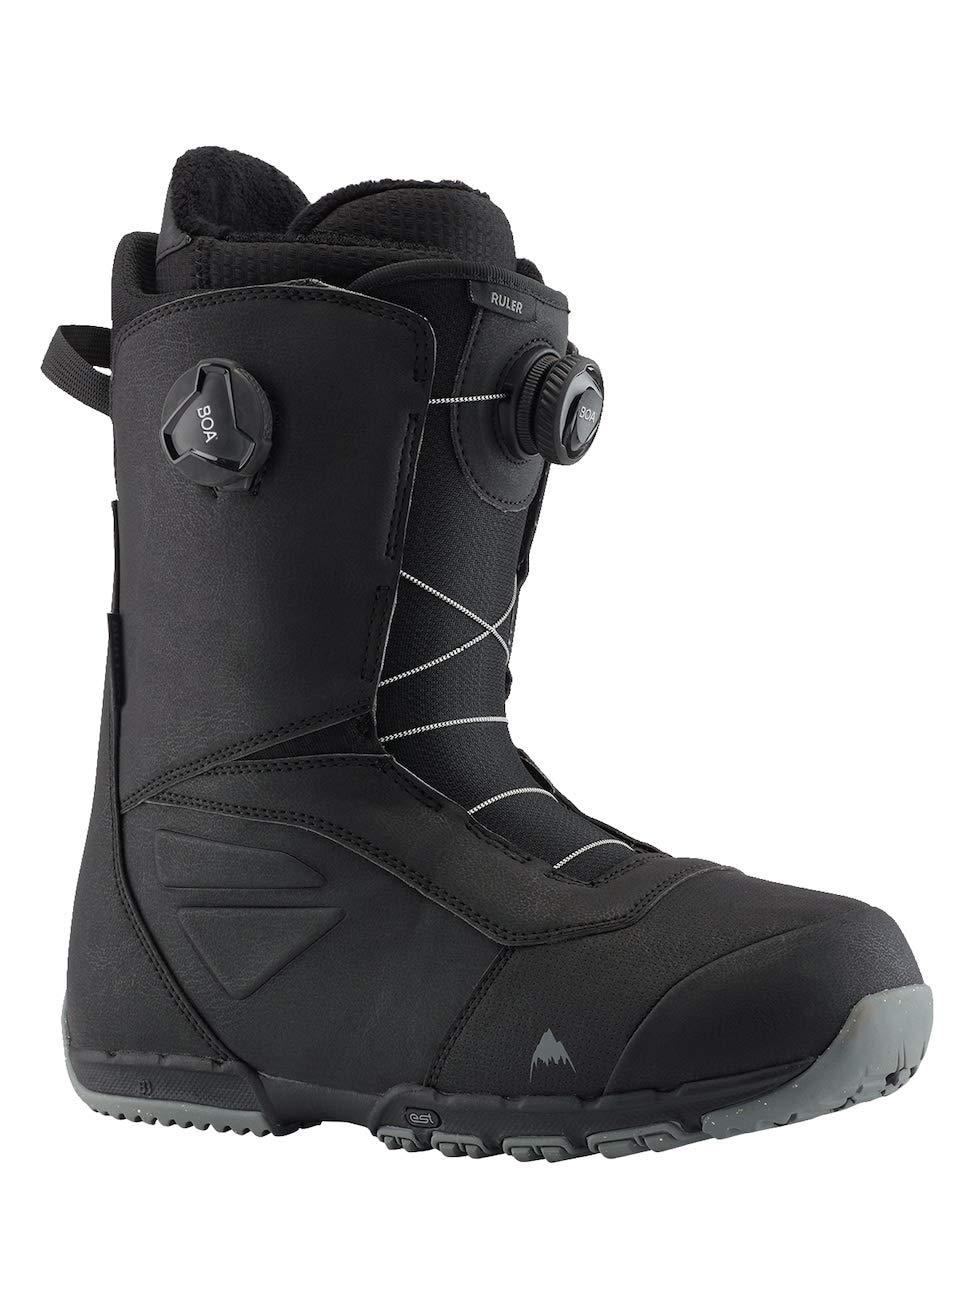 Men's Ruler Boa Black Boots